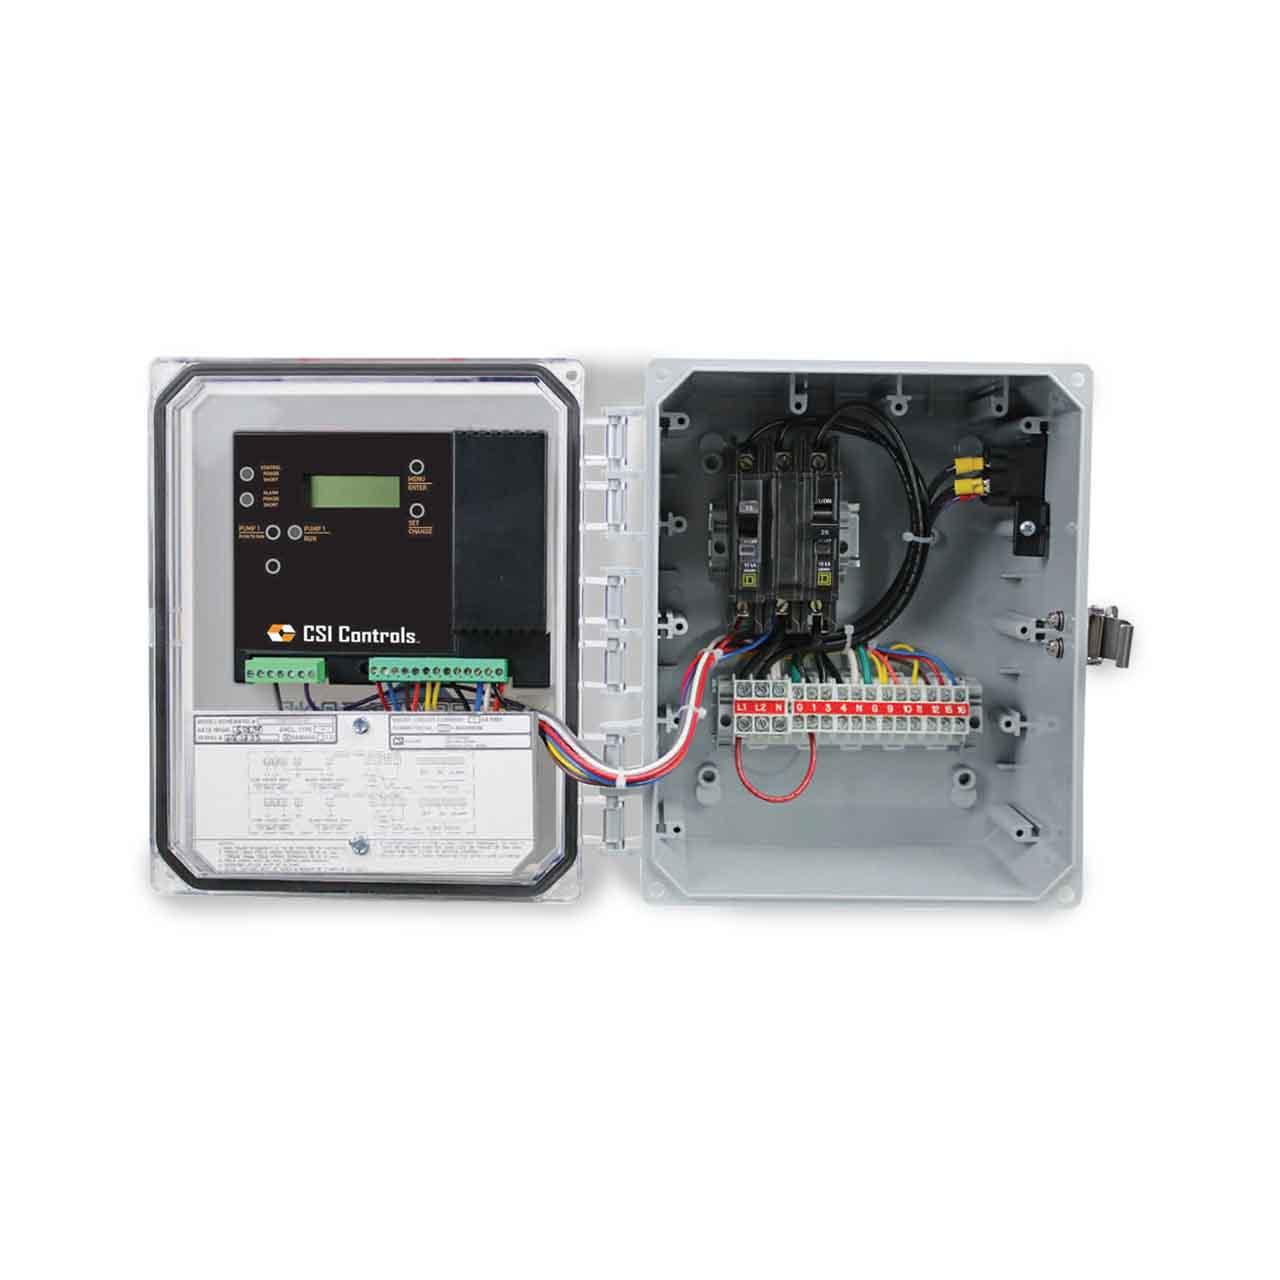 Csi Controls Csi Controls Pzsf230 Power Zone Simplex